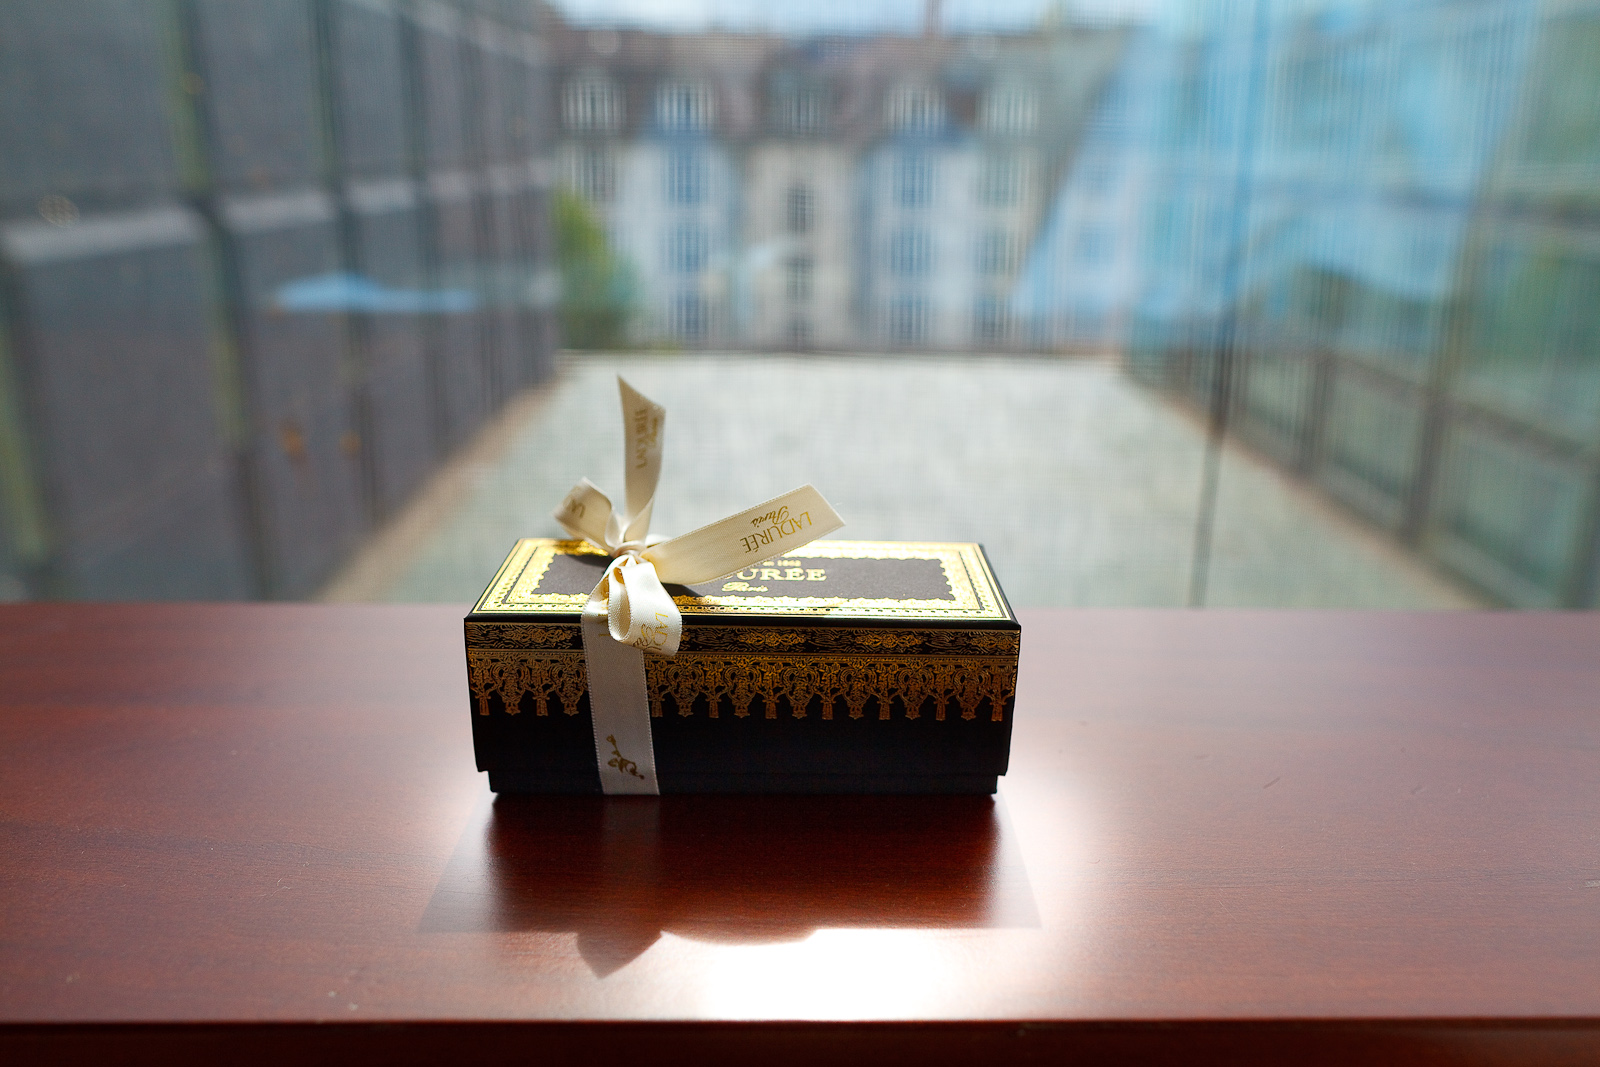 Box of 6 macarons